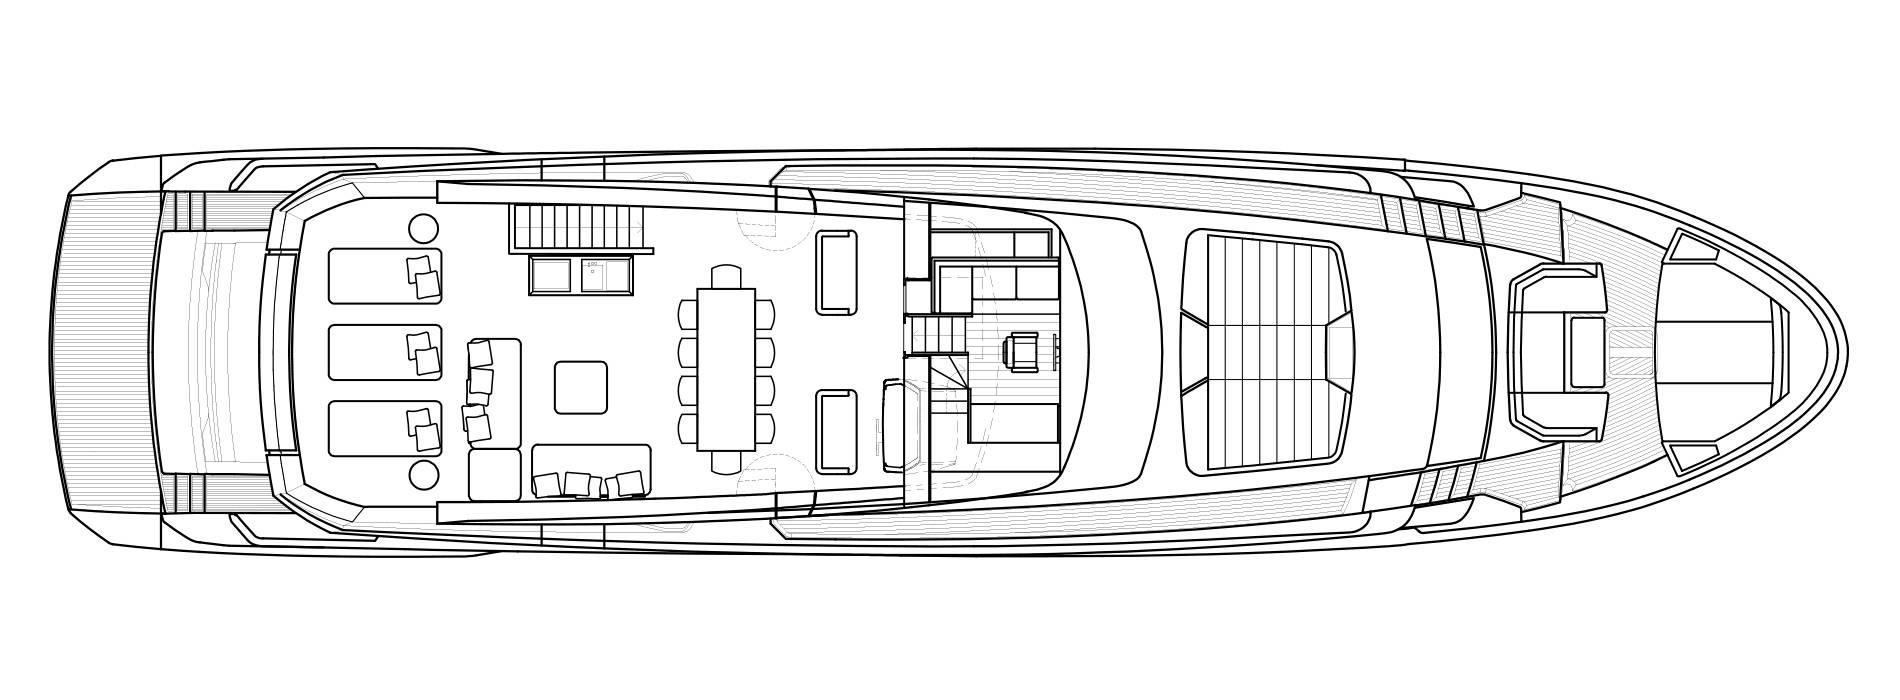 Sanlorenzo Yachts SL102 Asymmetric Флайбридж